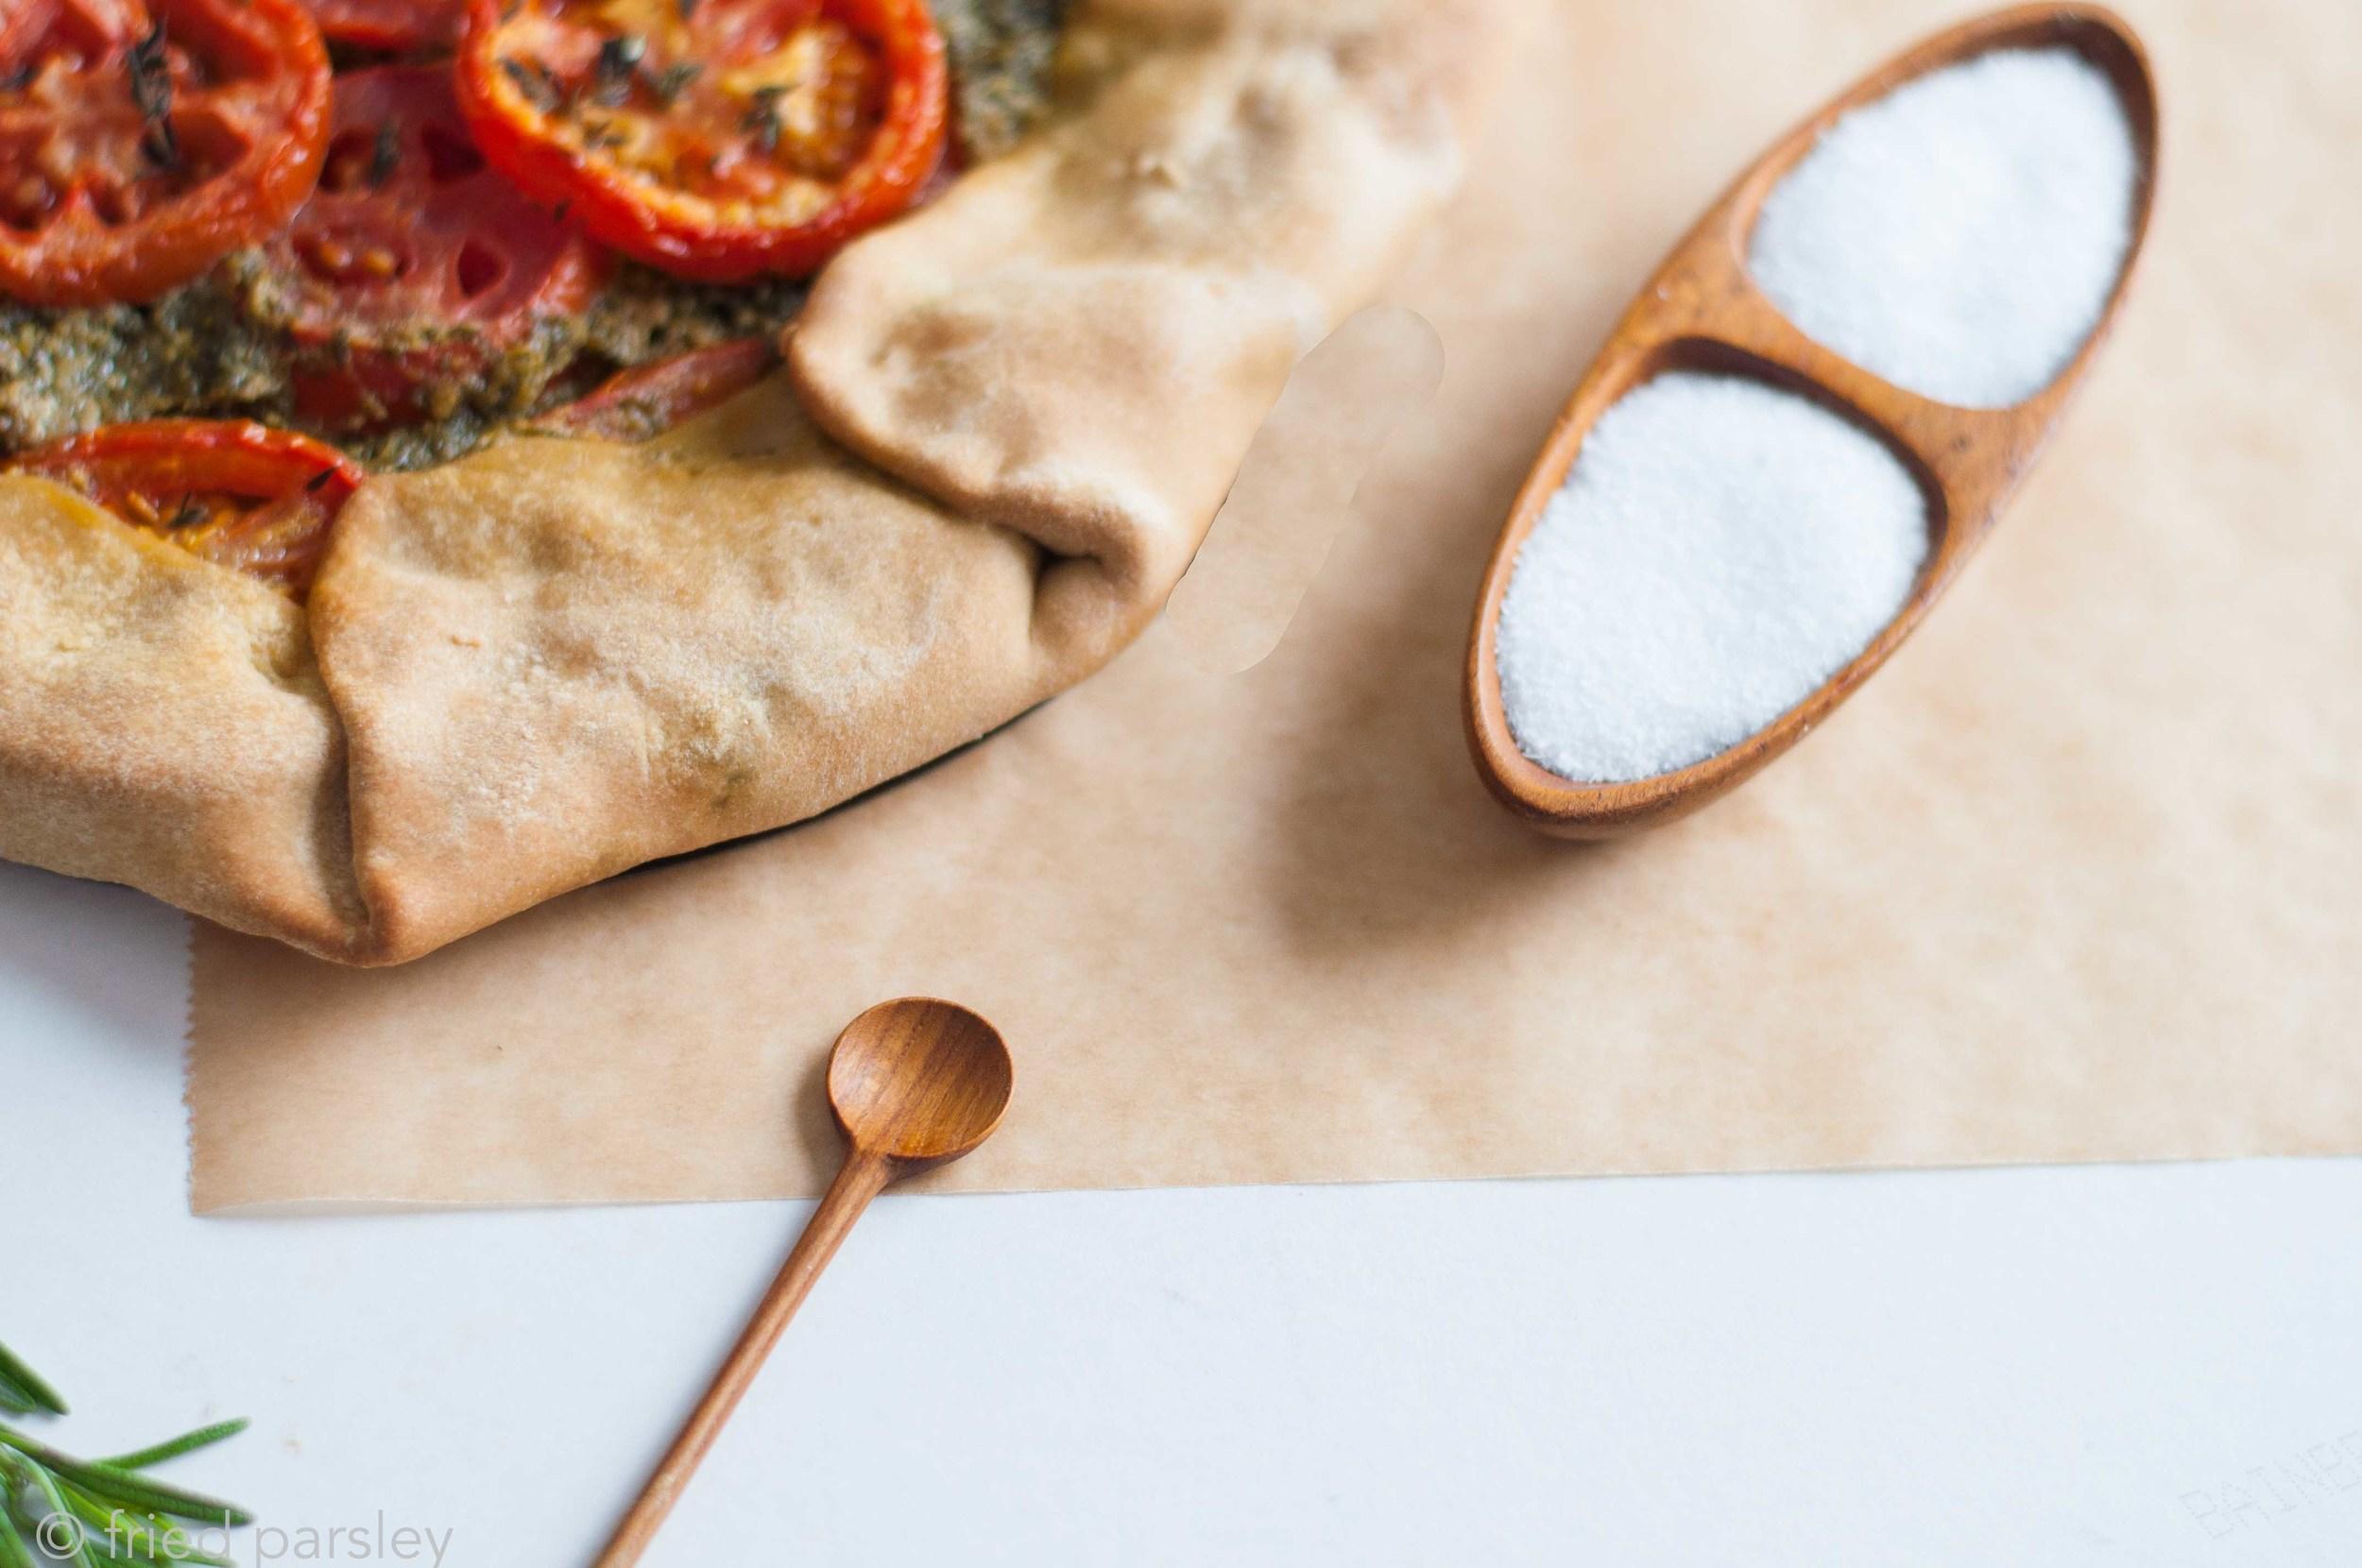 tomato-kale-pesto-tart-vegan-fried-parsley